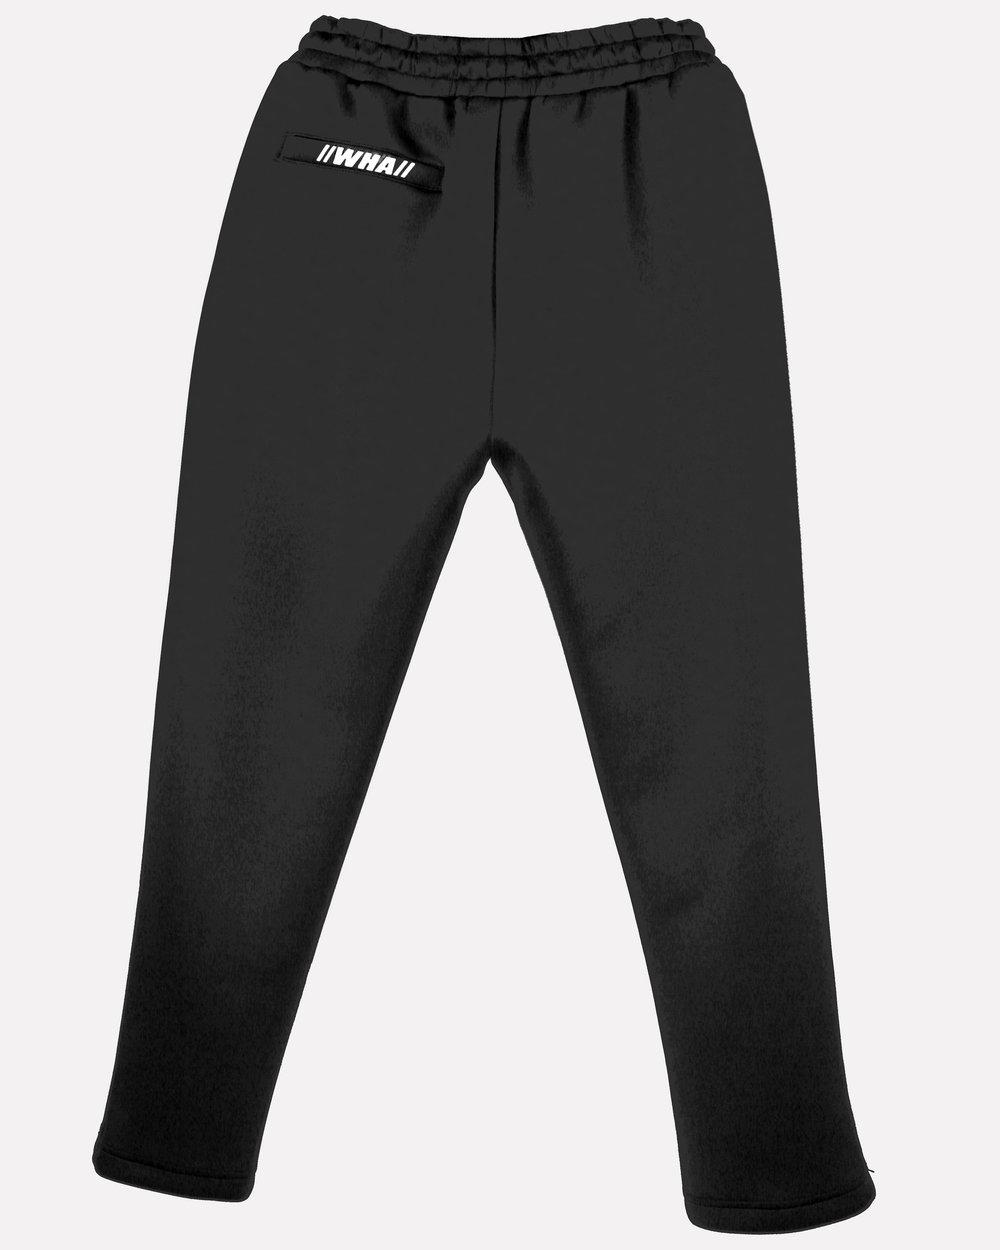 Pants Back Black 2.jpg